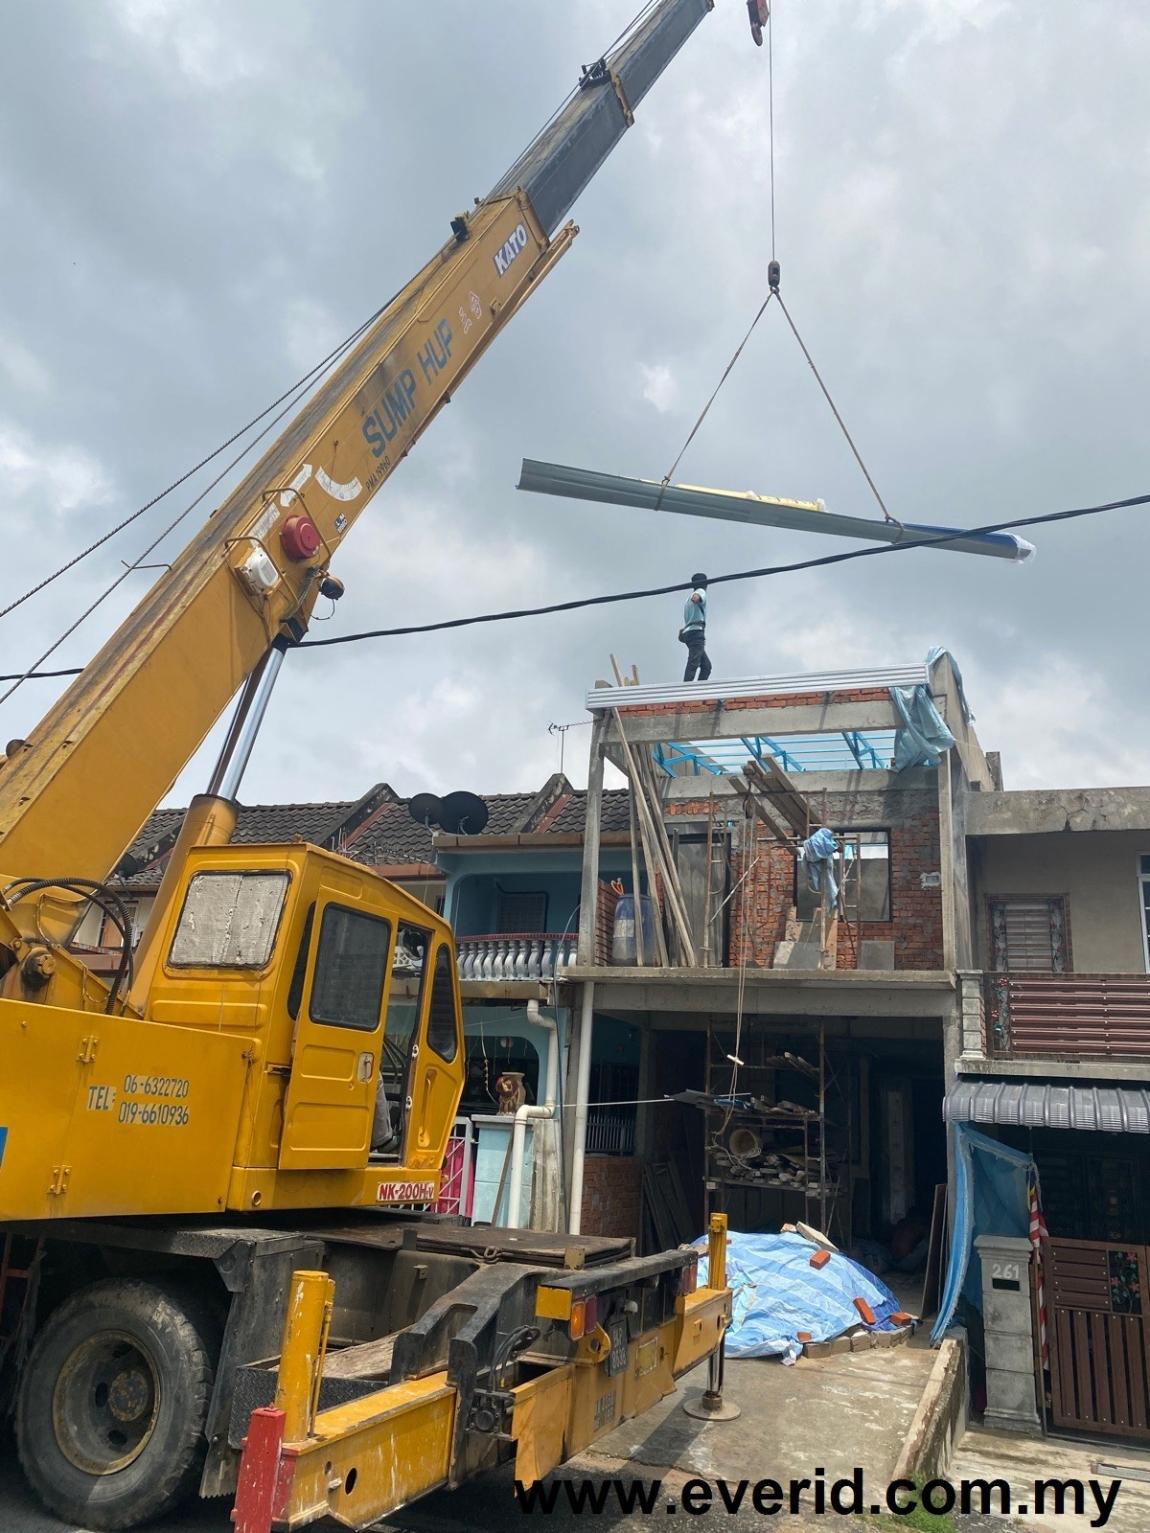 Seremban Taman Dusun Setia Double Storey Extension Renovation Refer Seremban Negeri Sembilan Whole House Interior Design & Renovation Reference